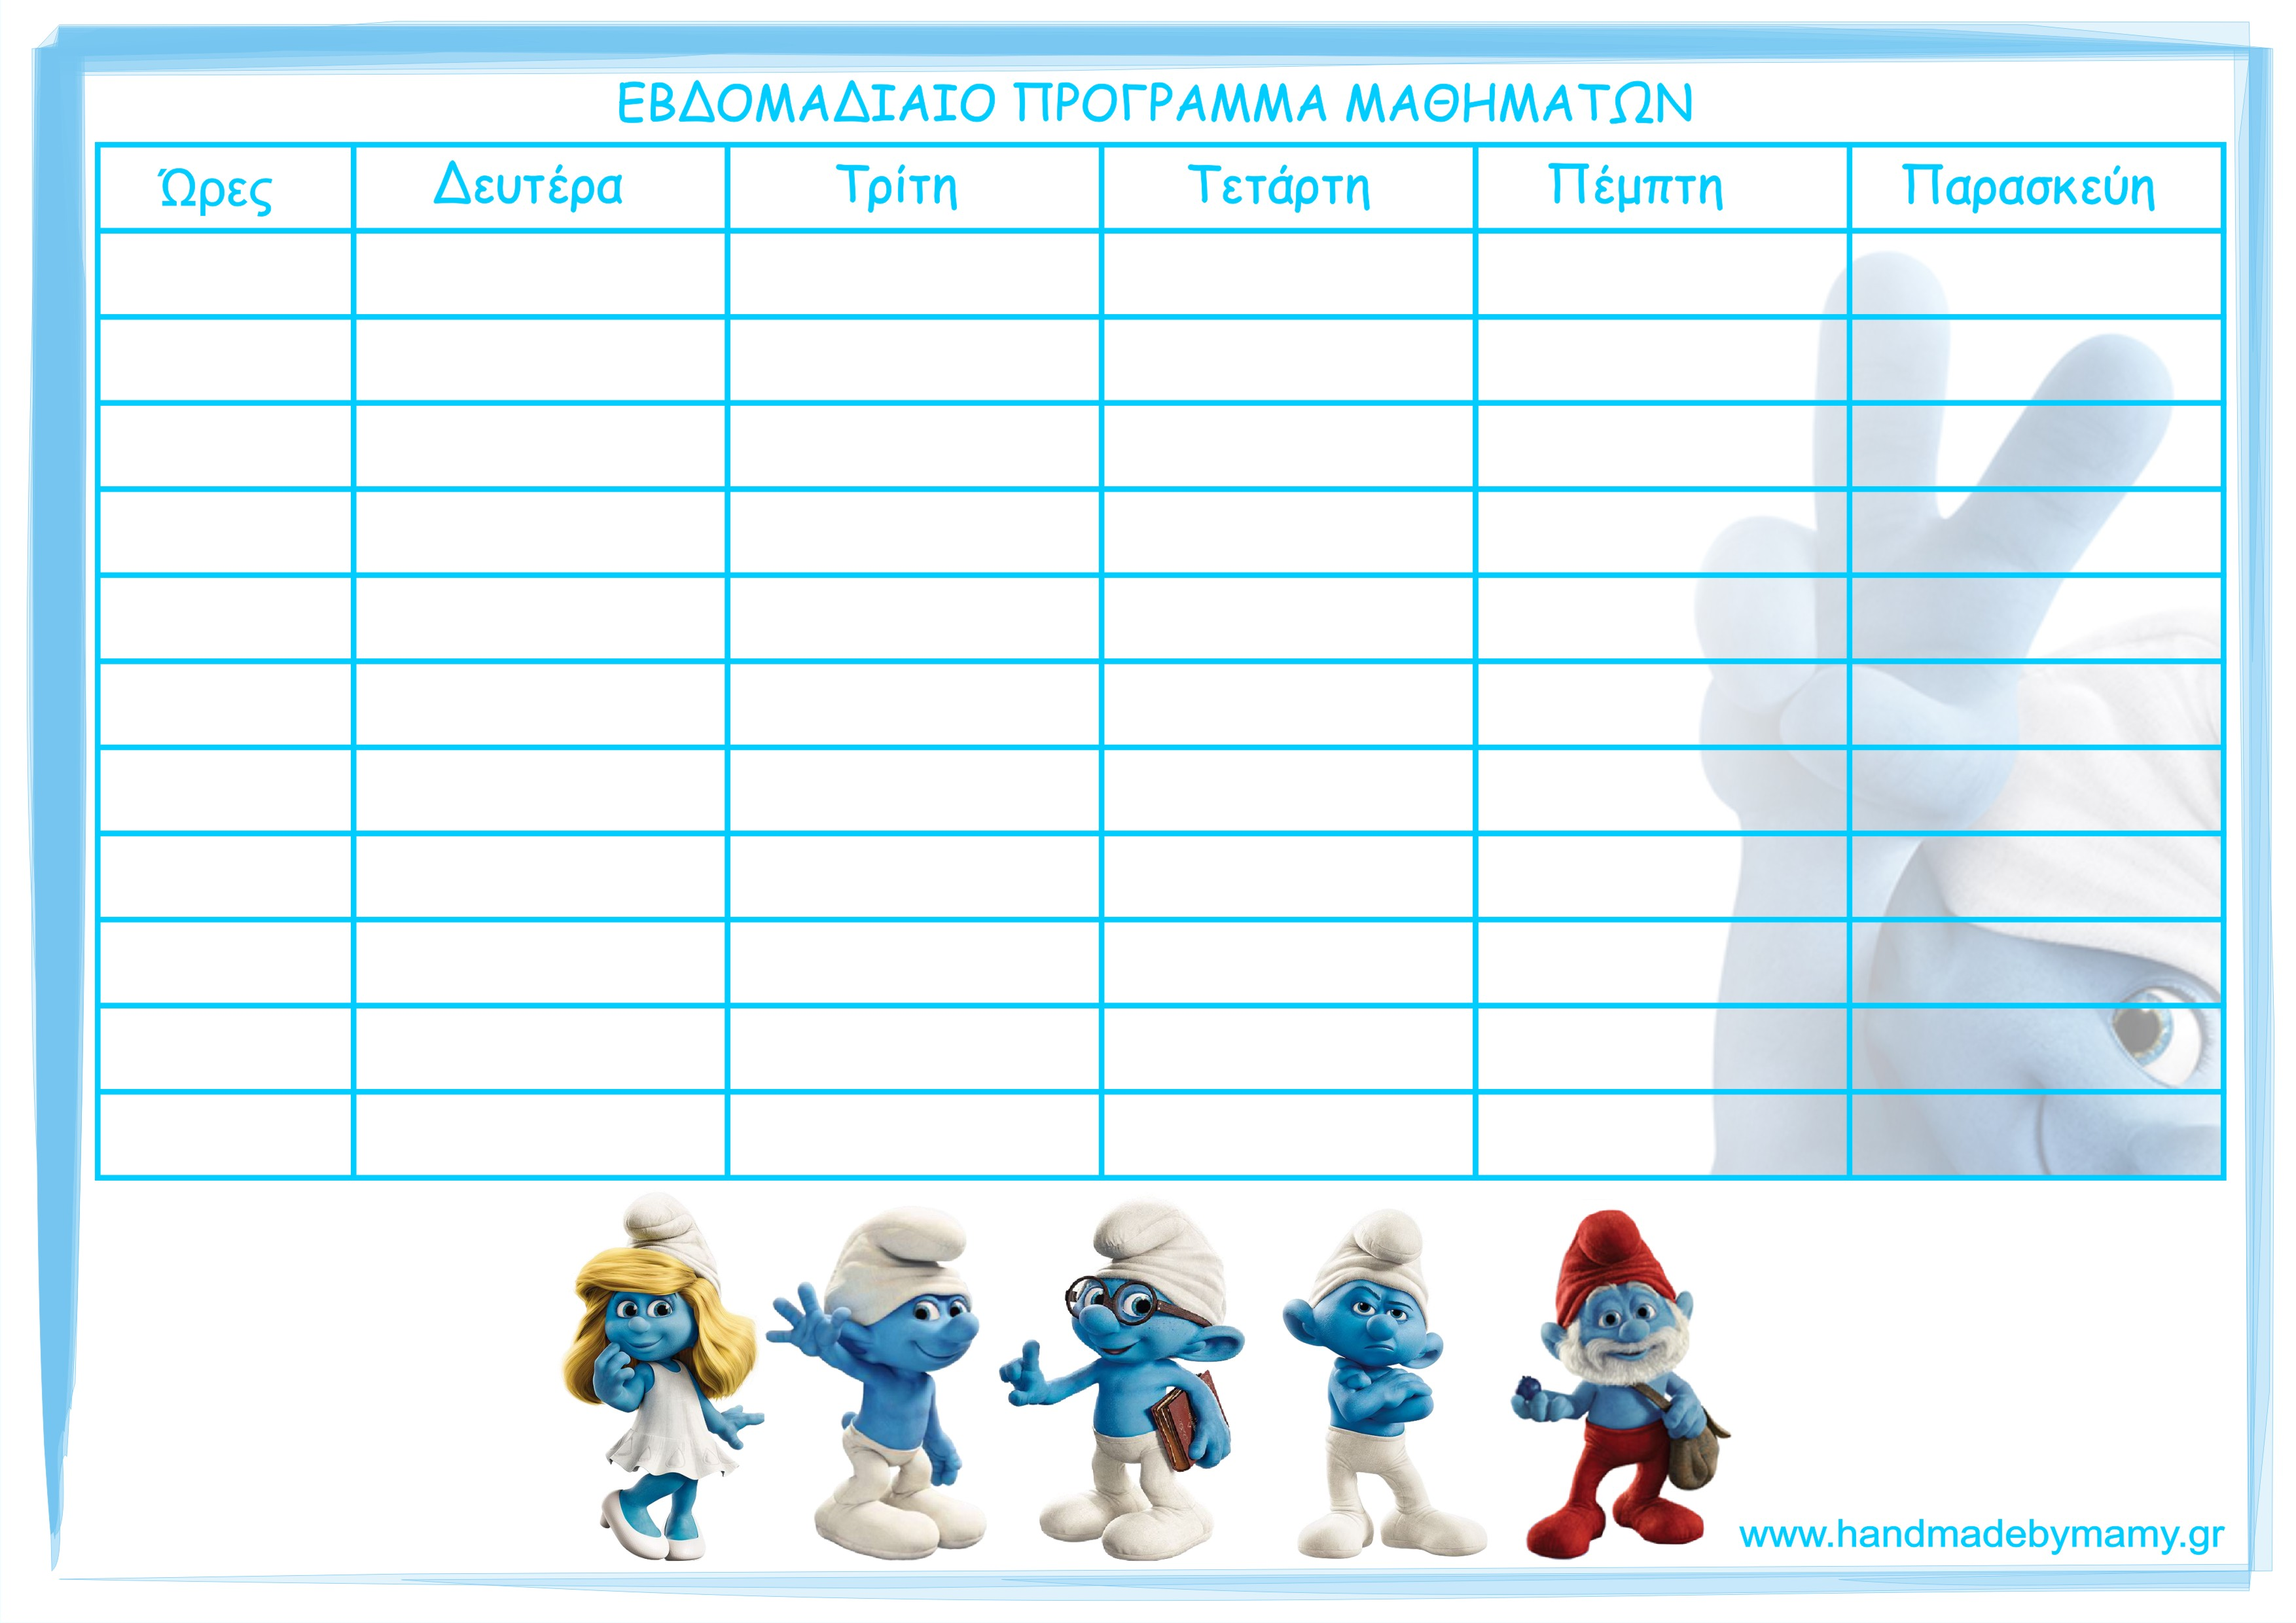 Sxoliko programma_8